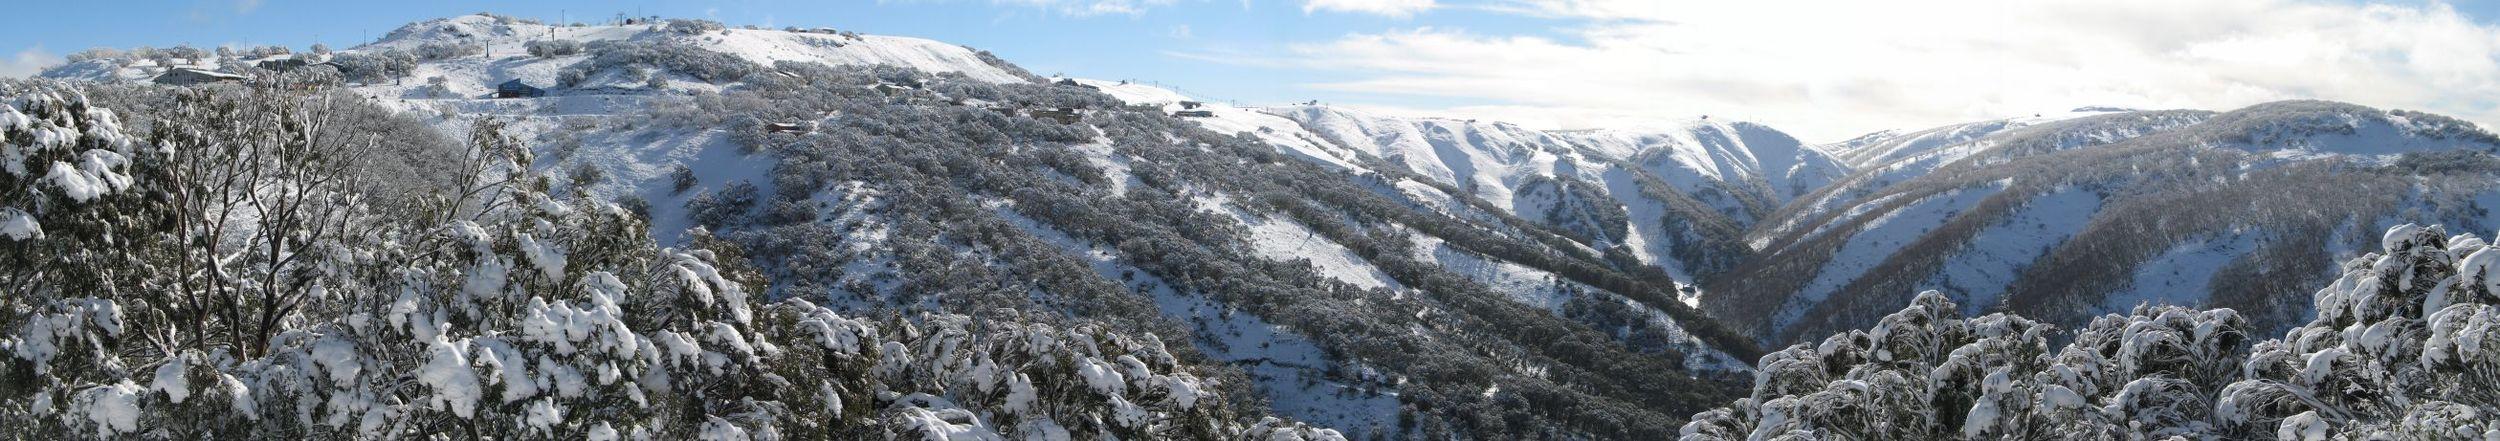 View of Mt Hotham ski fields after 20 cm fresh snowfall